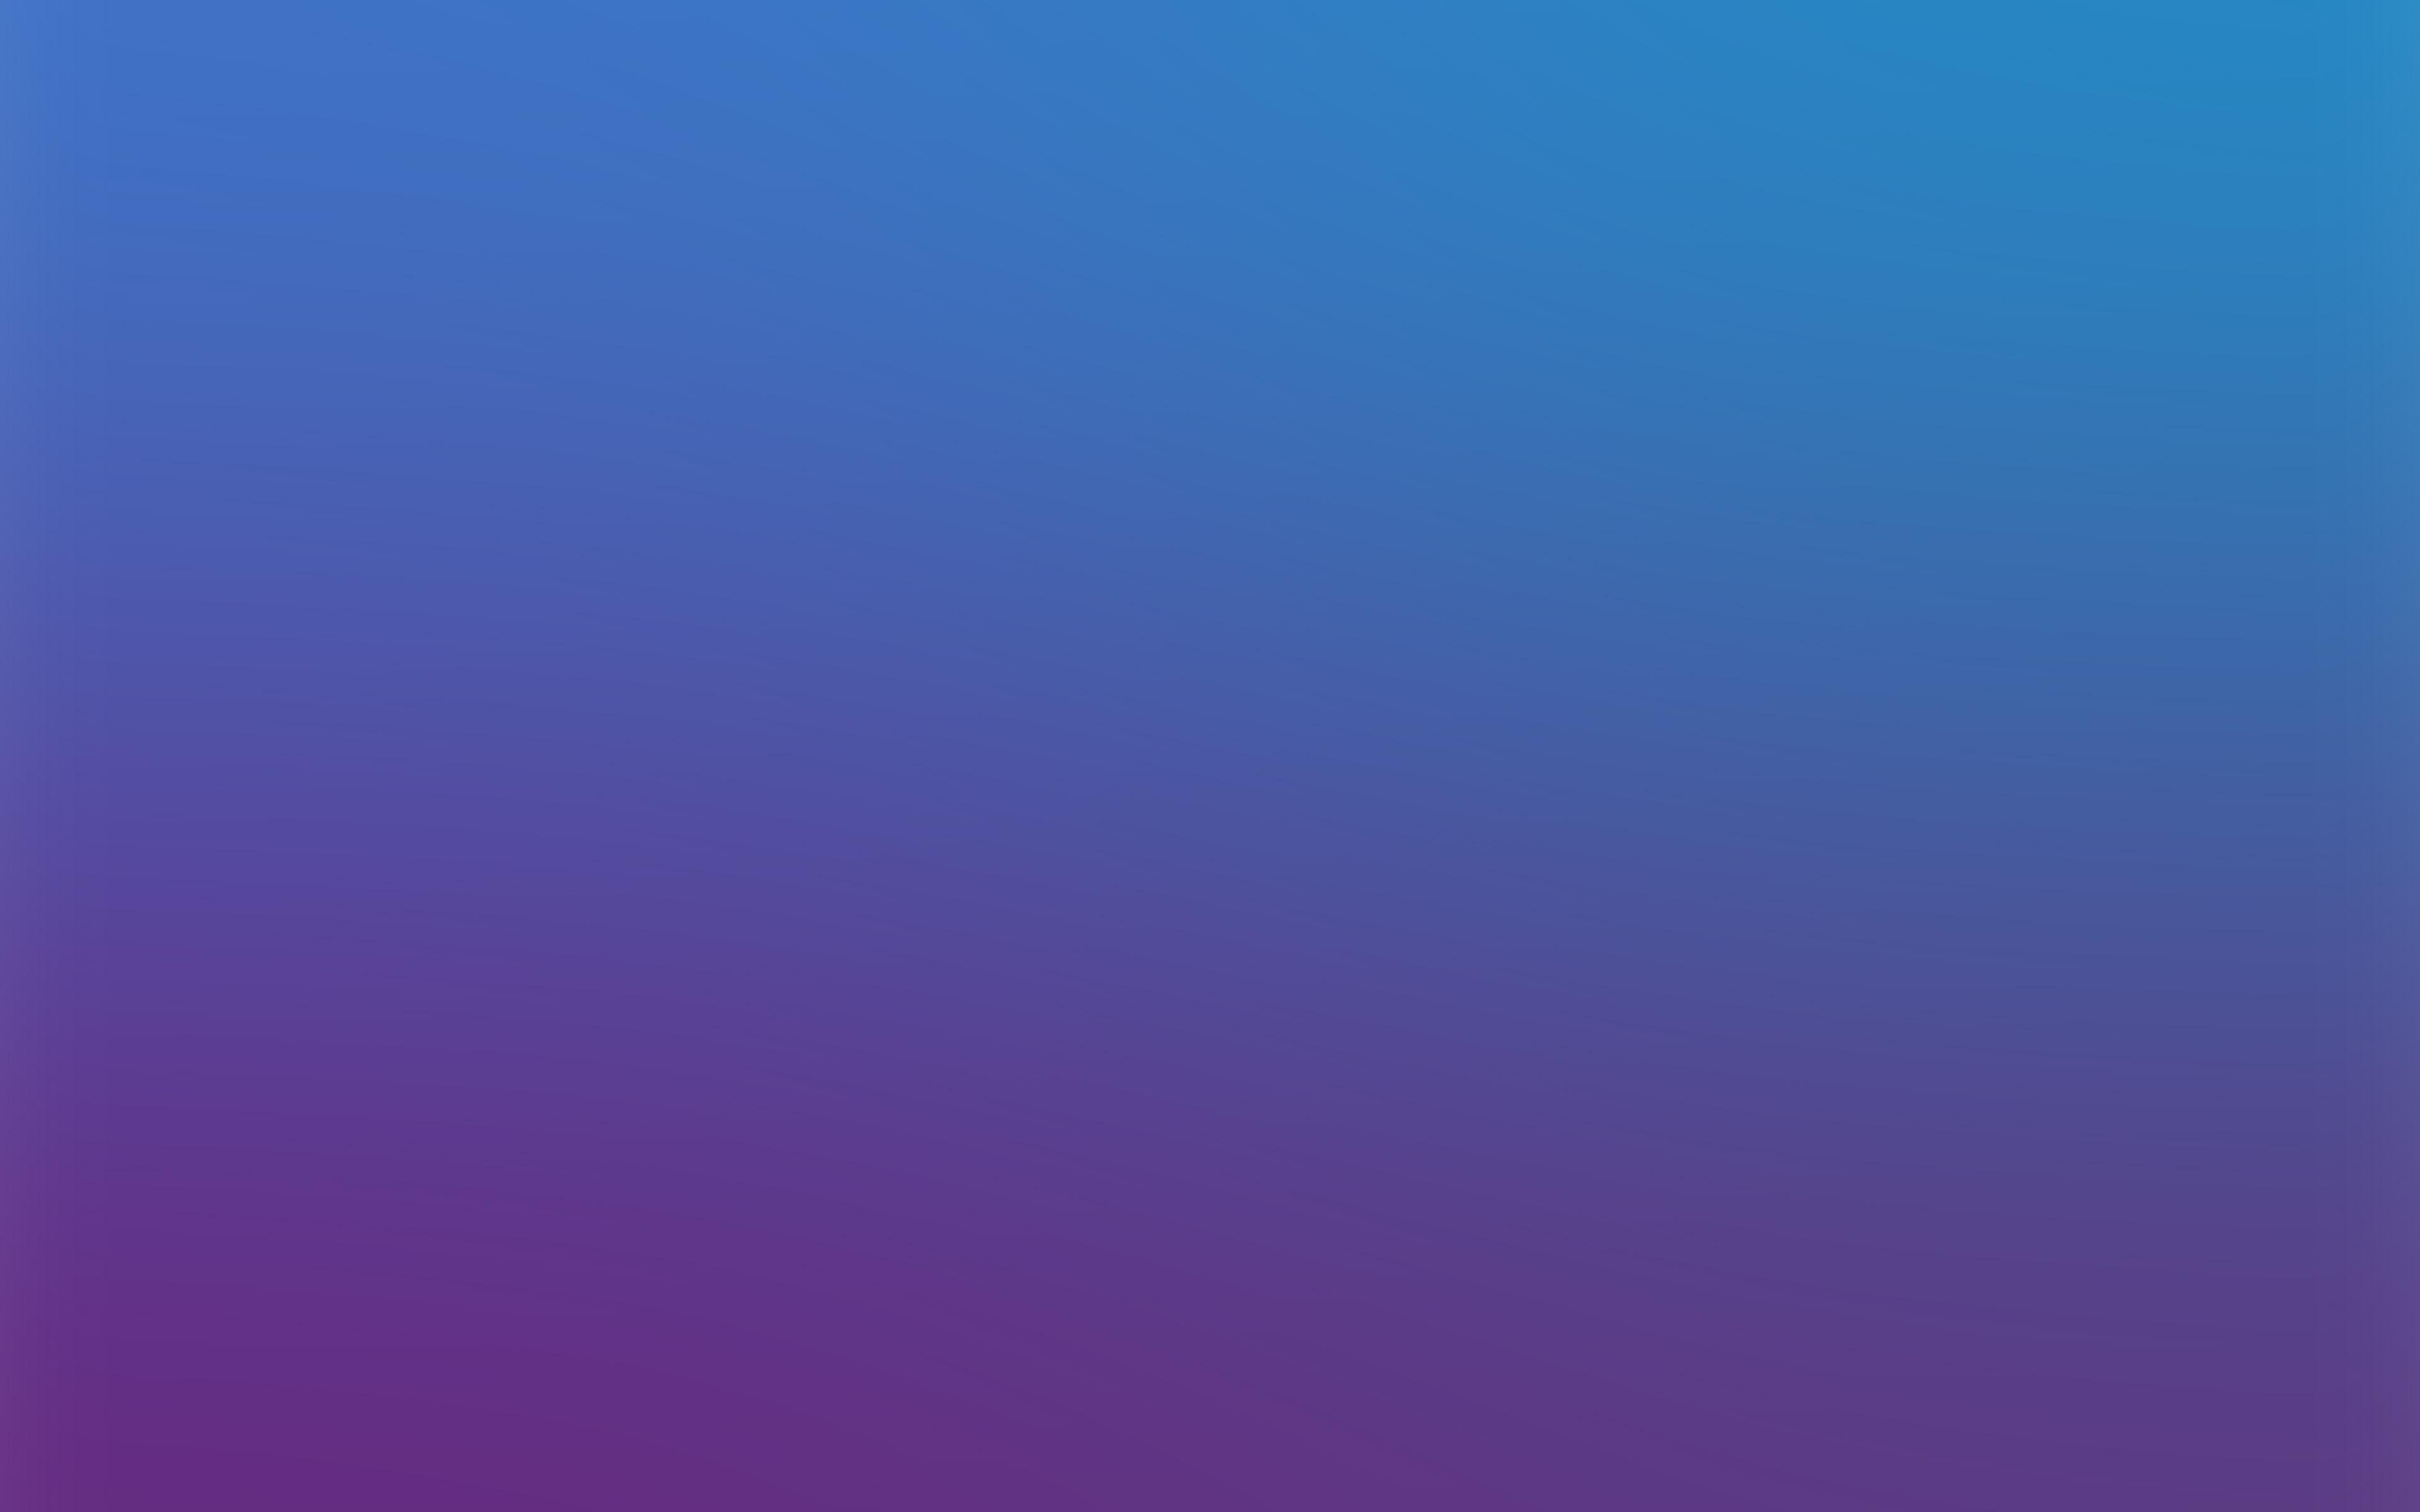 Purple Iphone 5 Wallpaper Sj99 Blue Purple Gradation Blur Wallpaper